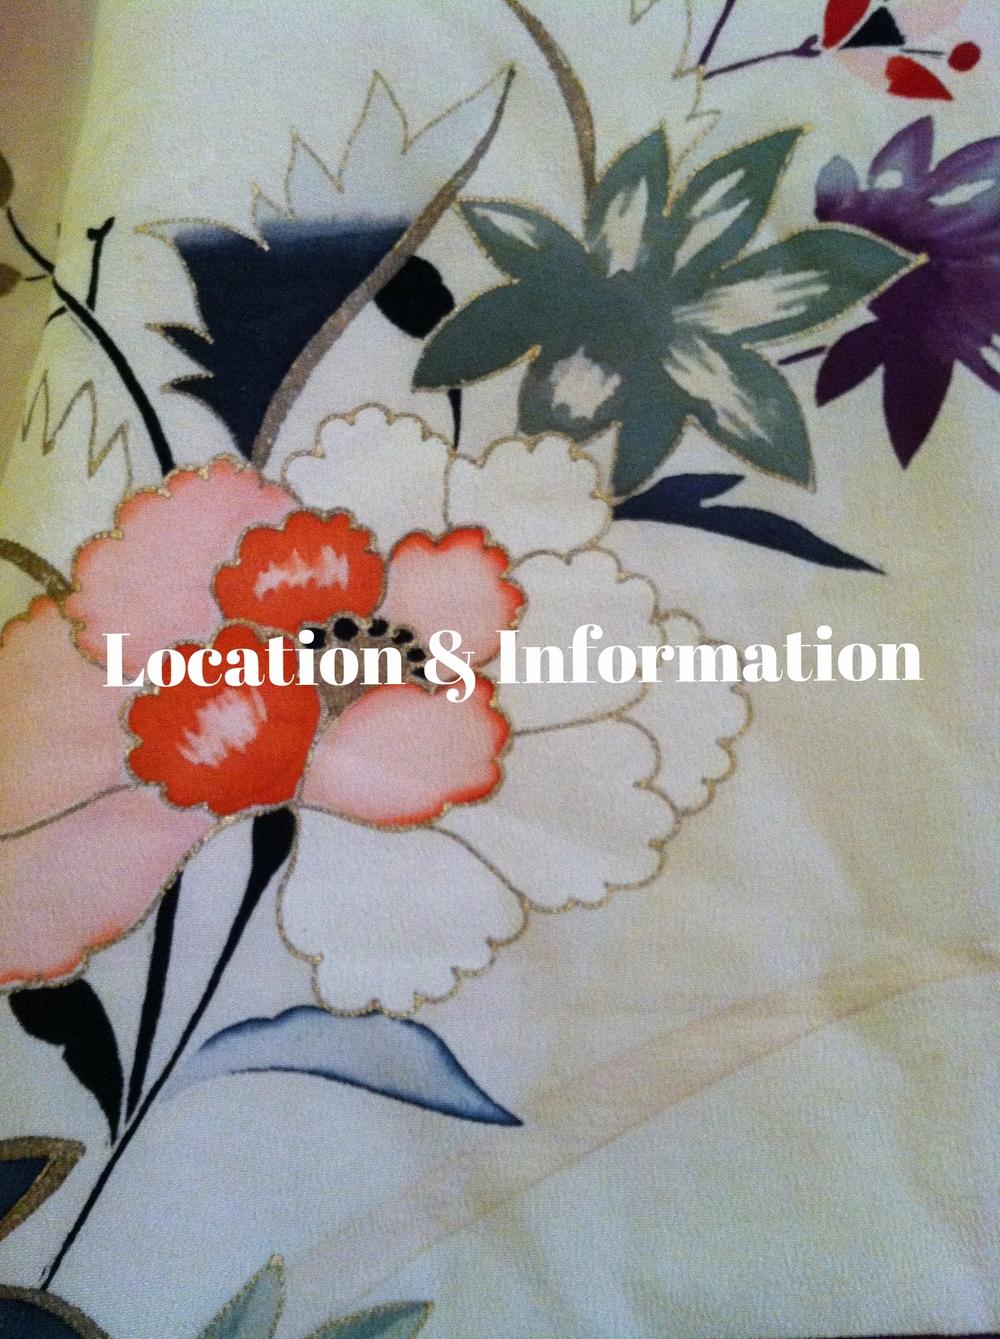 Location & Information